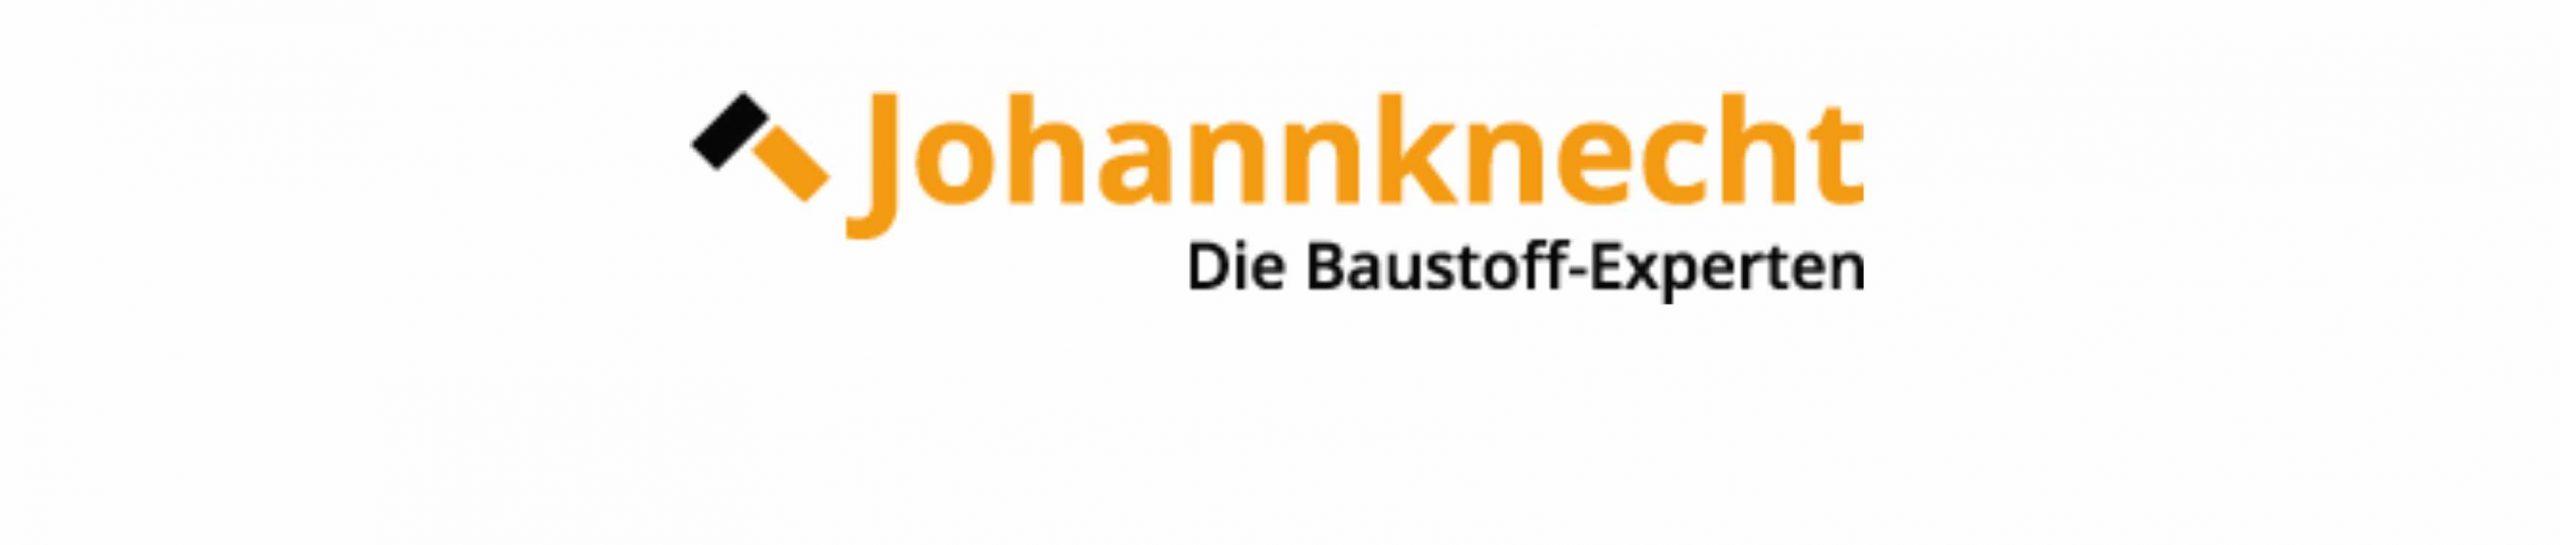 Johannknecht GmbH Baustoffe - Gütersloh